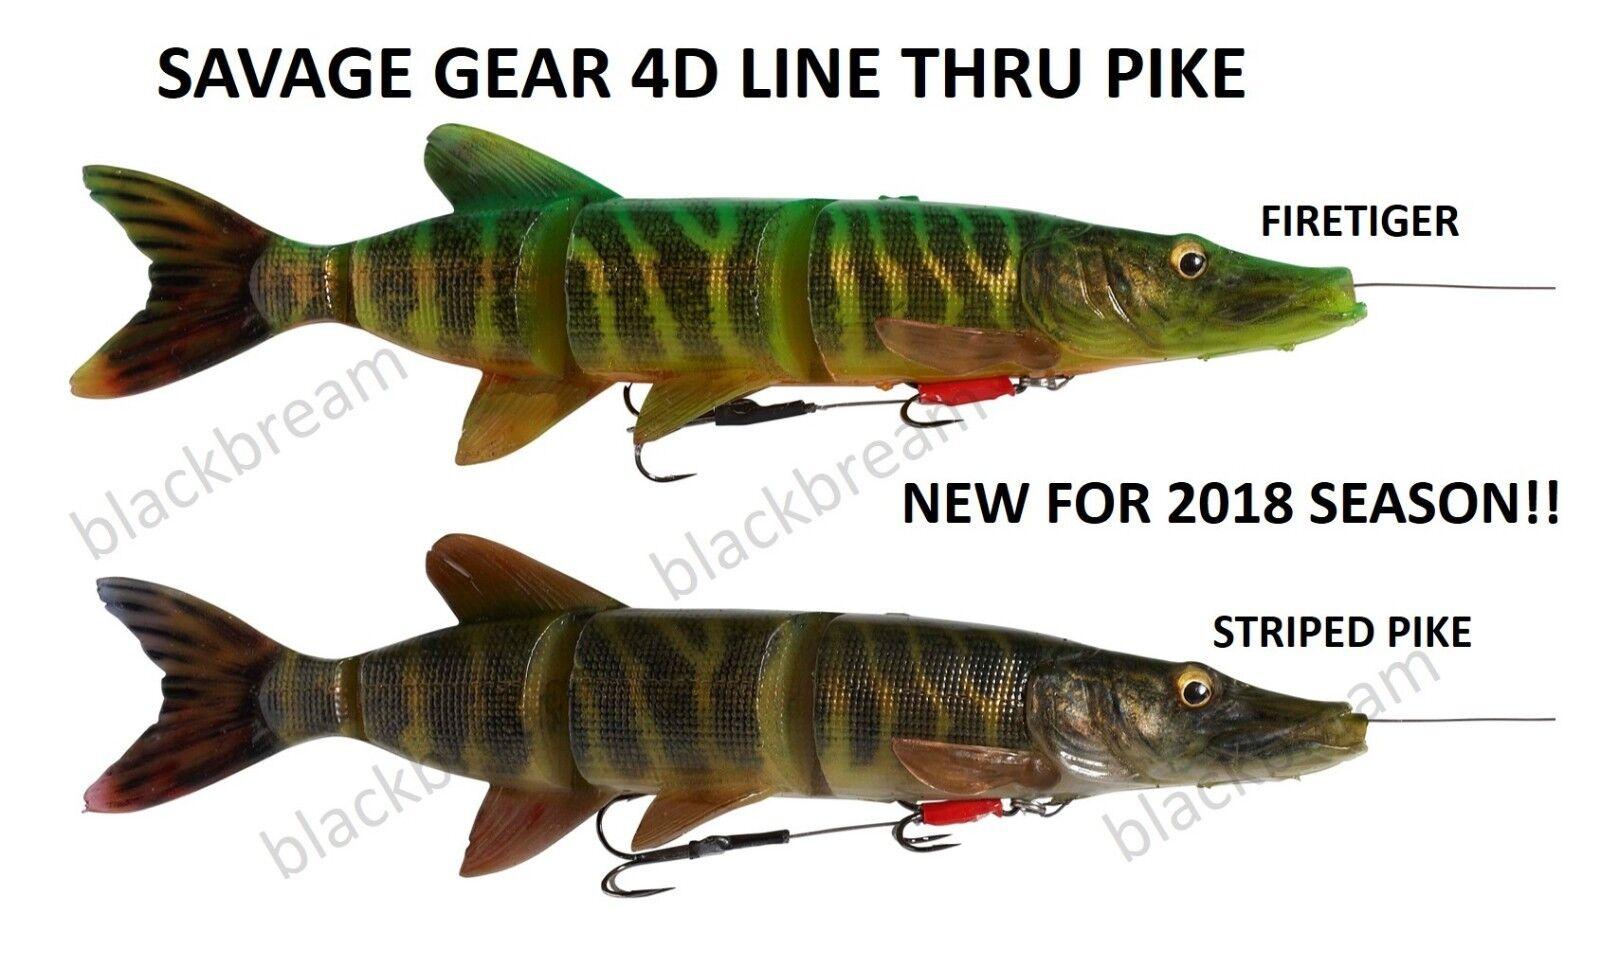 Savage Gear 4d Line Thru Trout 15cm-35g SS Swim Baits Cast pike zander Trolling